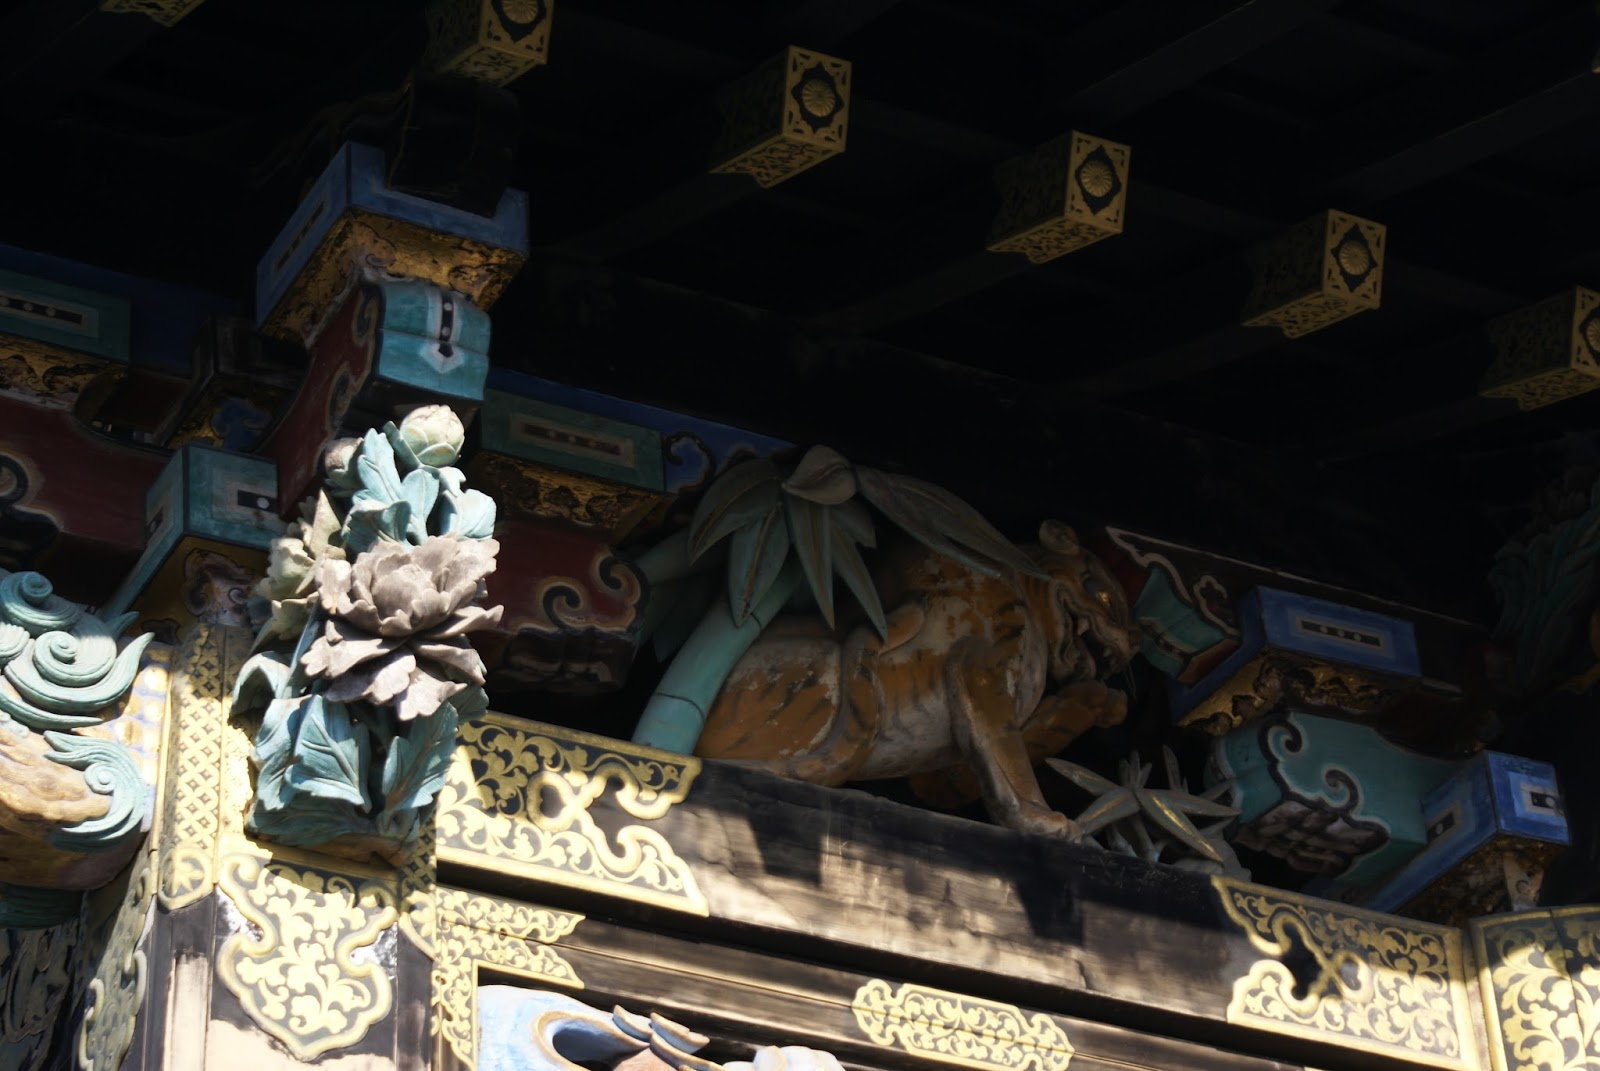 nishi hongan-ji kara-mon buddhist temple kyoto japan japon asia